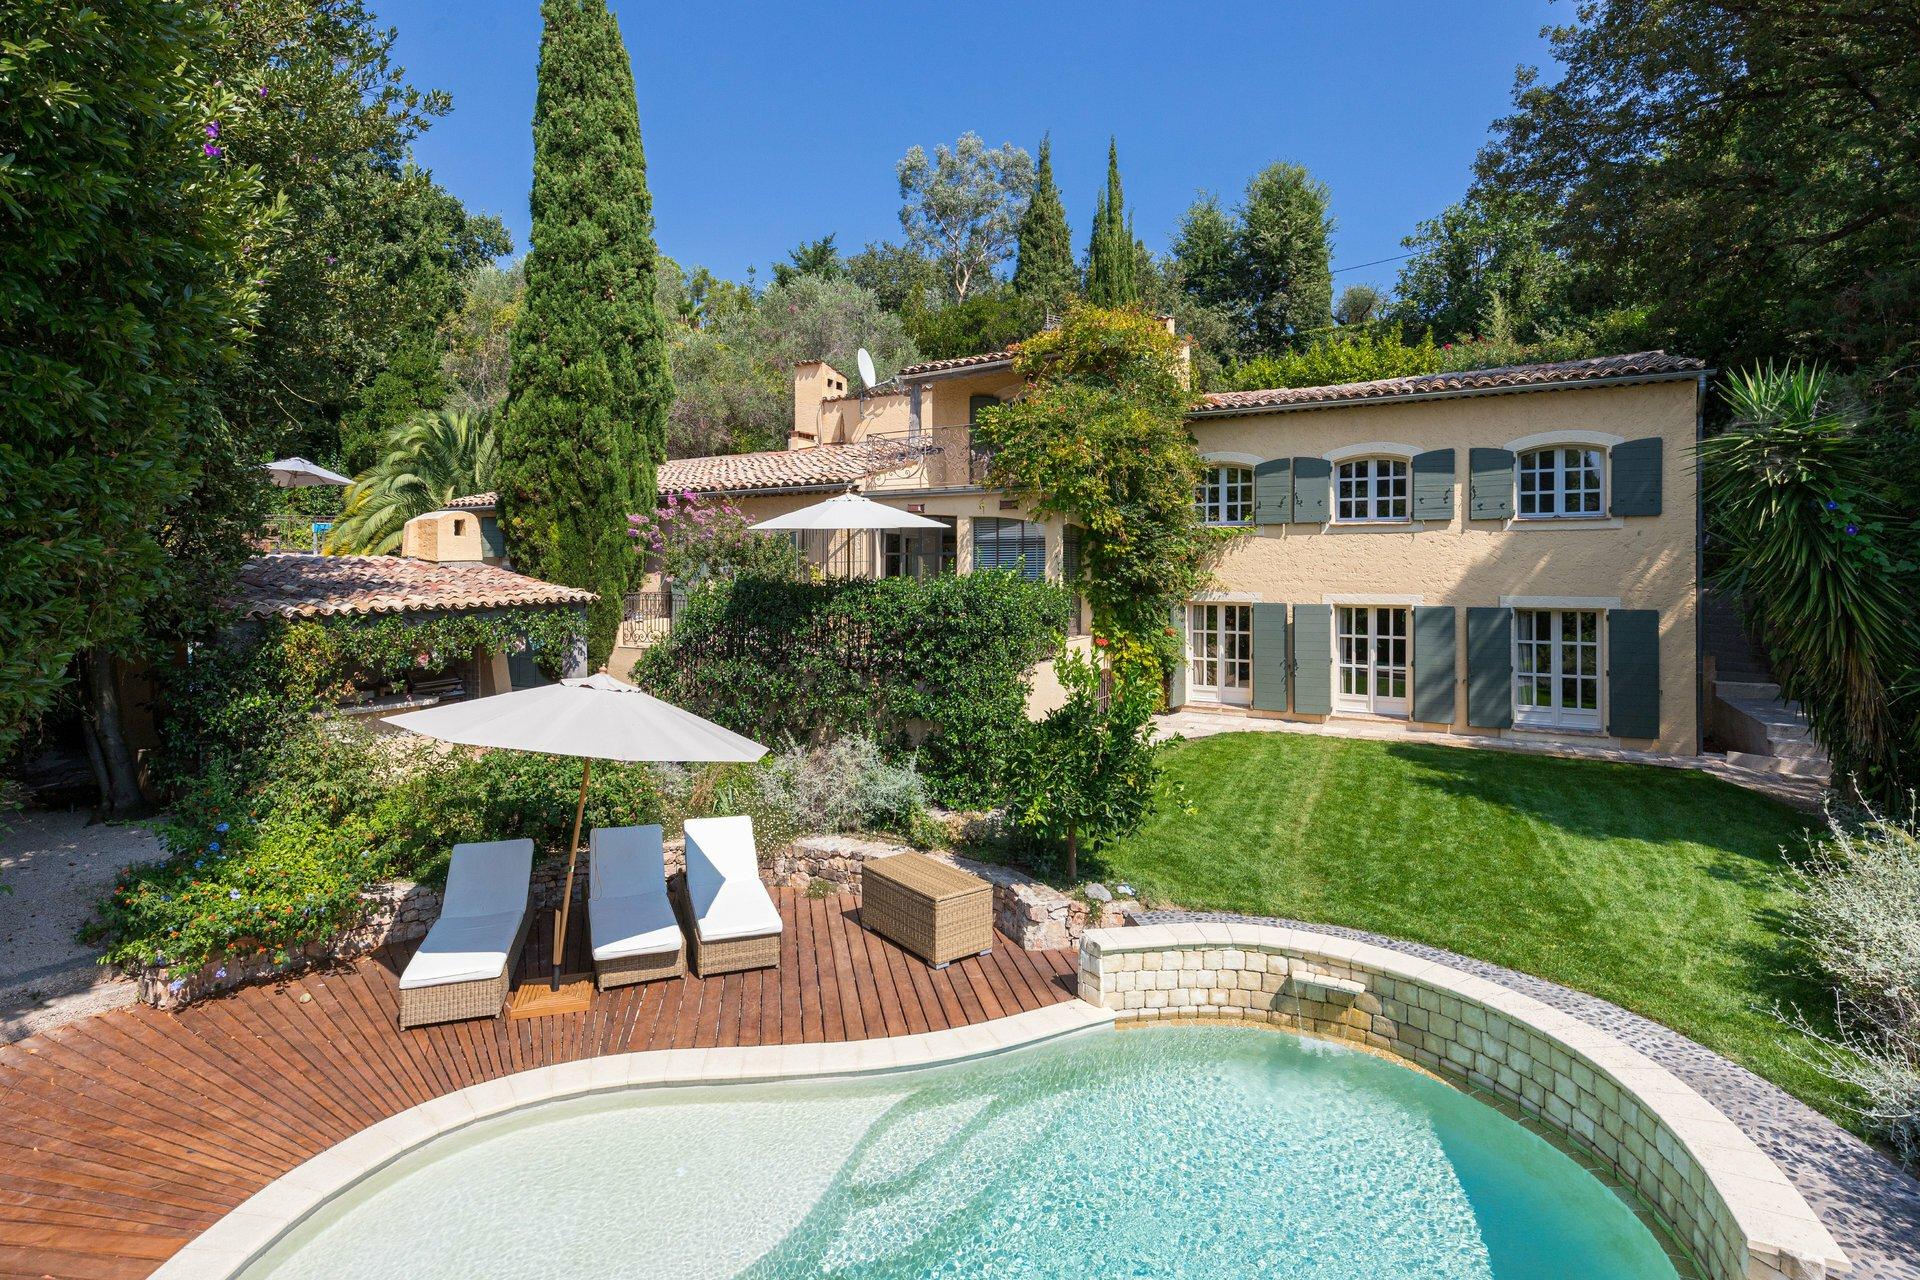 Villa in Mougins, Provence-Alpes-Côte d'Azur, France 1 - 10753099